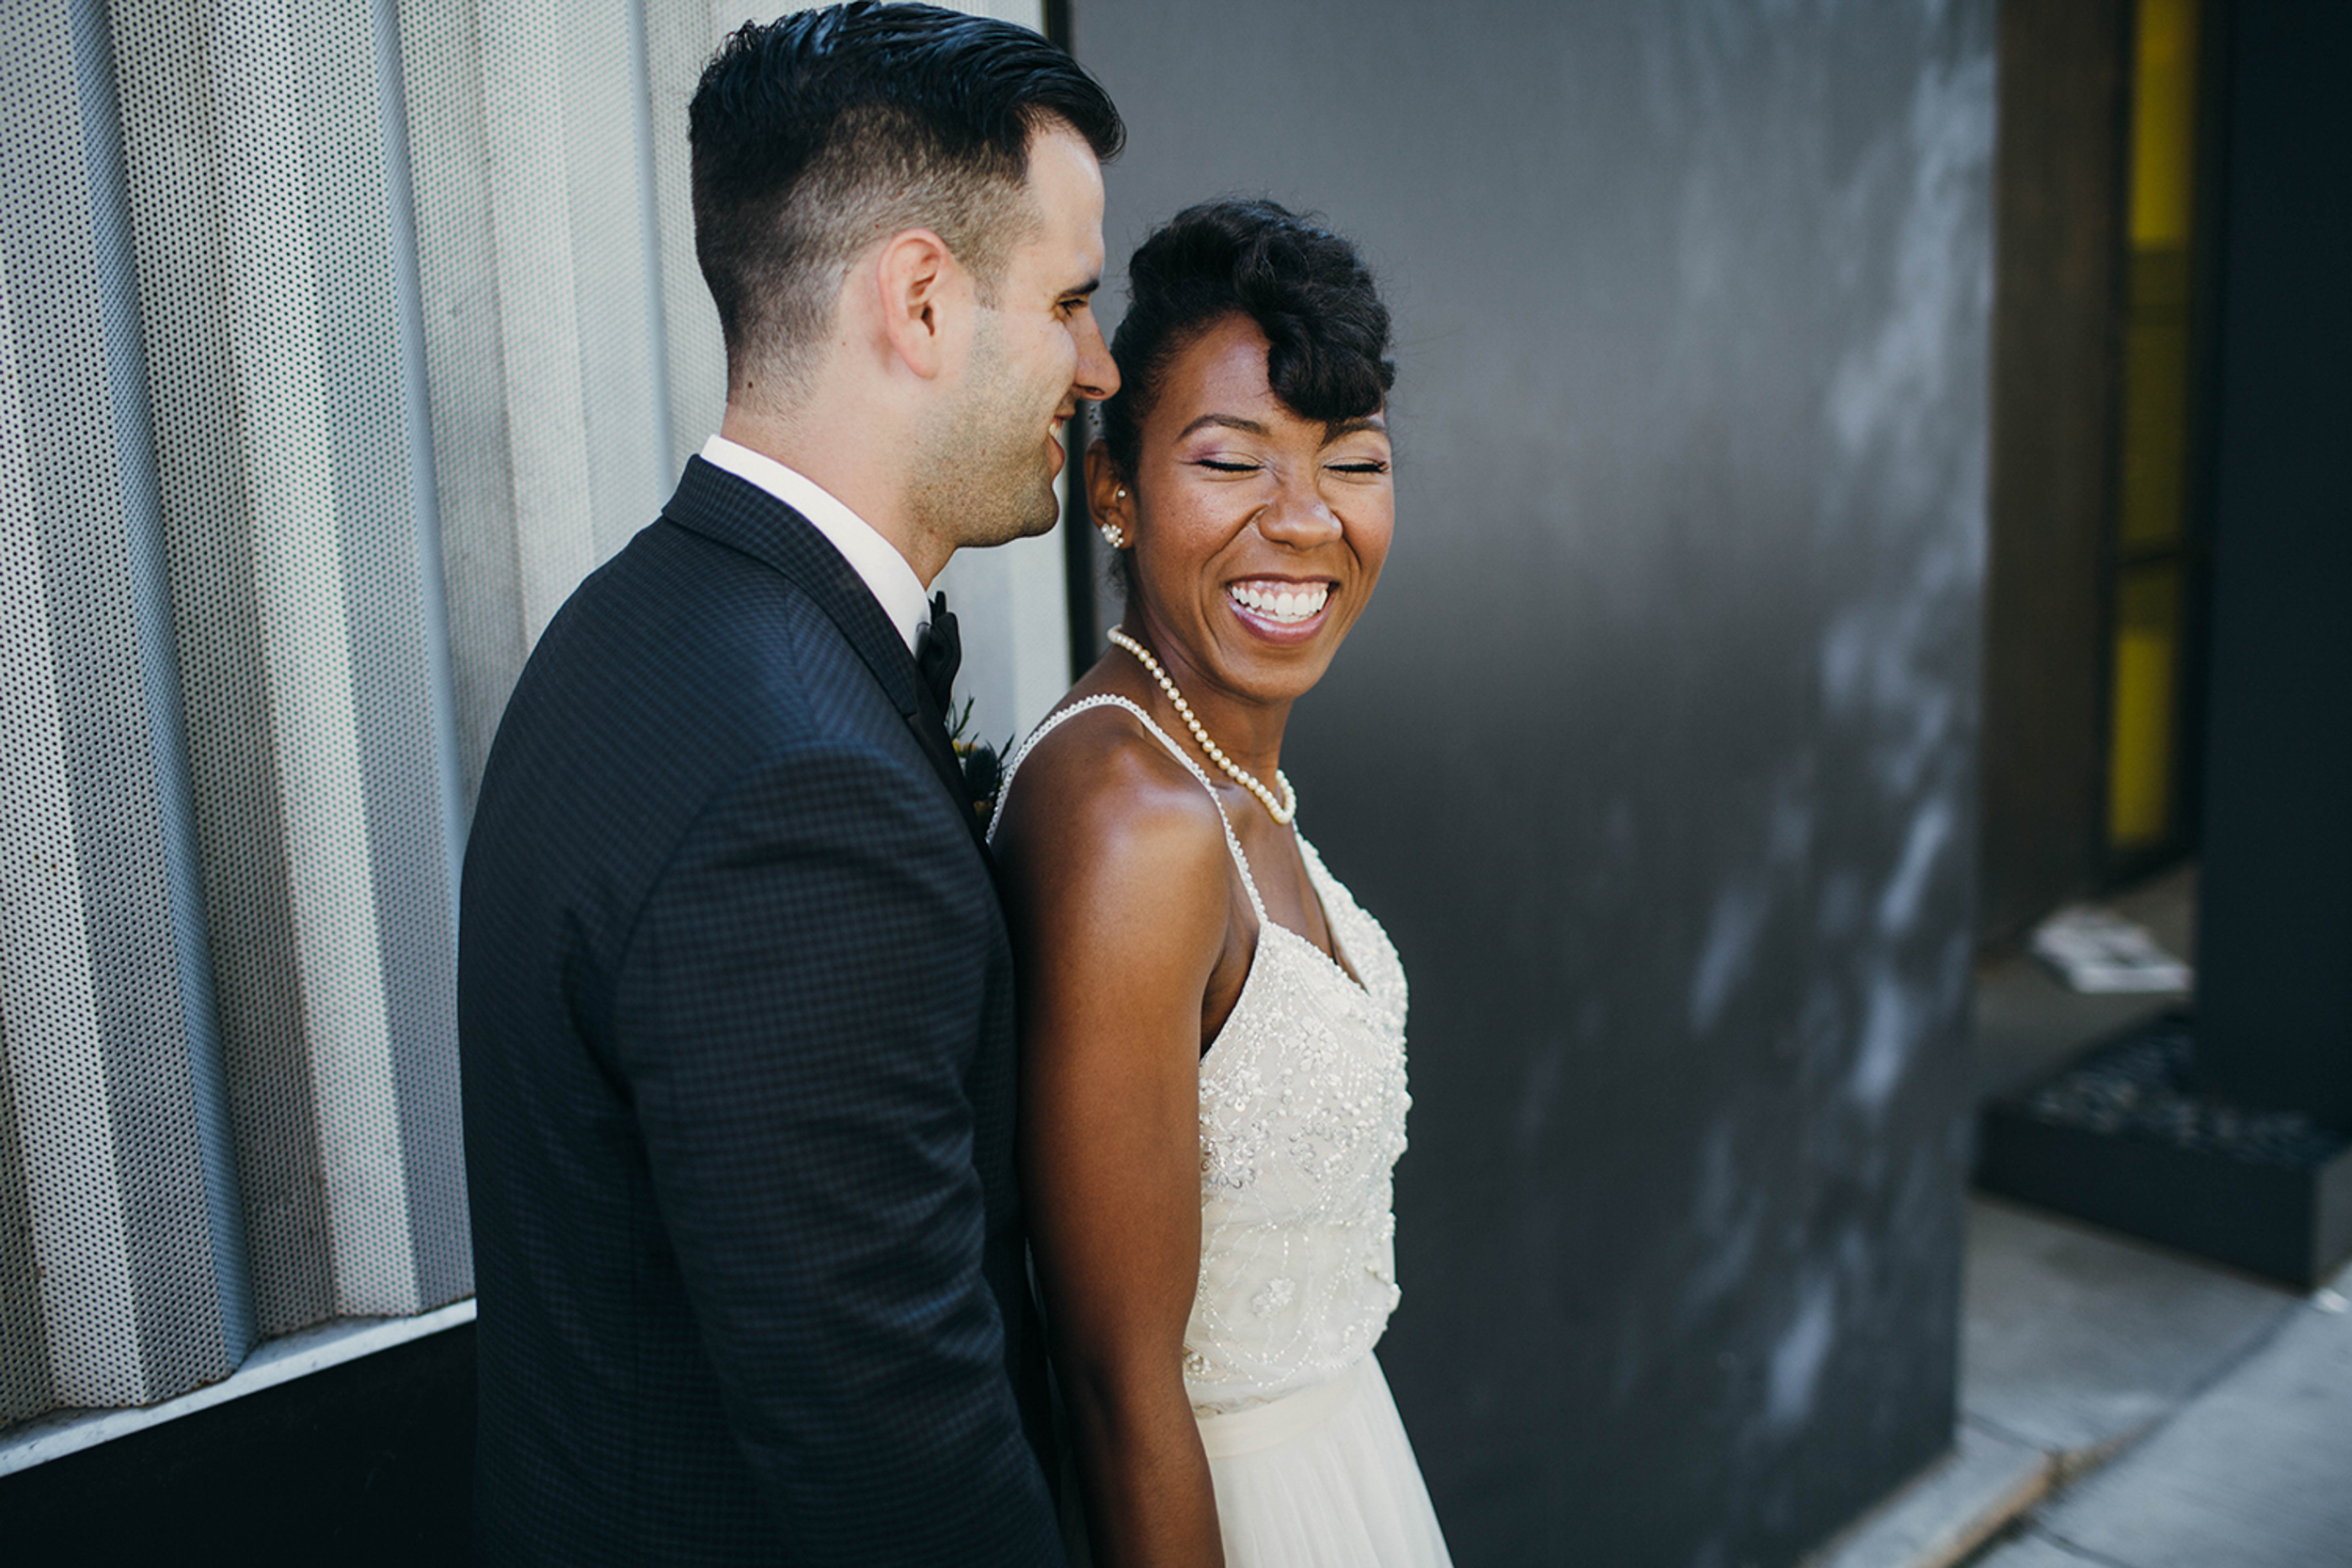 chicago.wedding.urban.intimate.zed451.lake.milton olive park-37.jpg